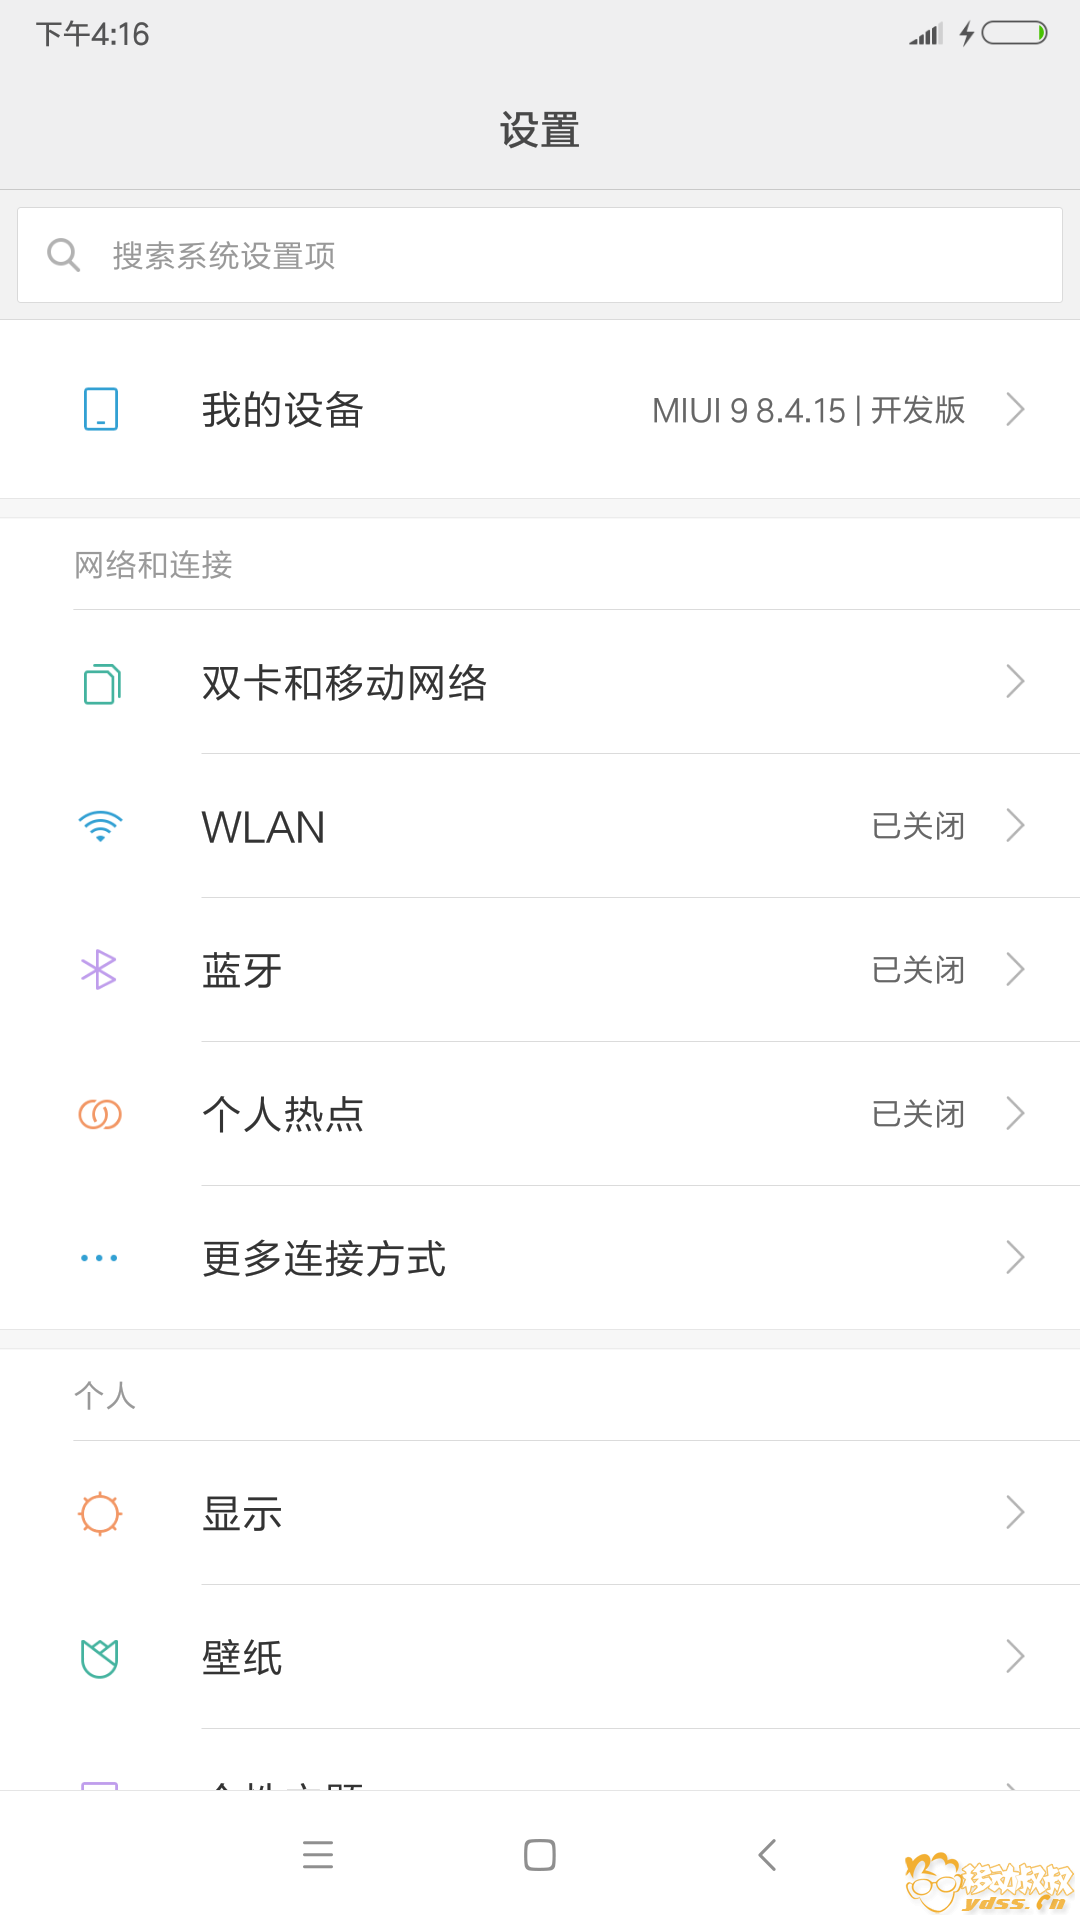 Screenshot_2018-04-15-16-16-19-494_com.android.settings.png